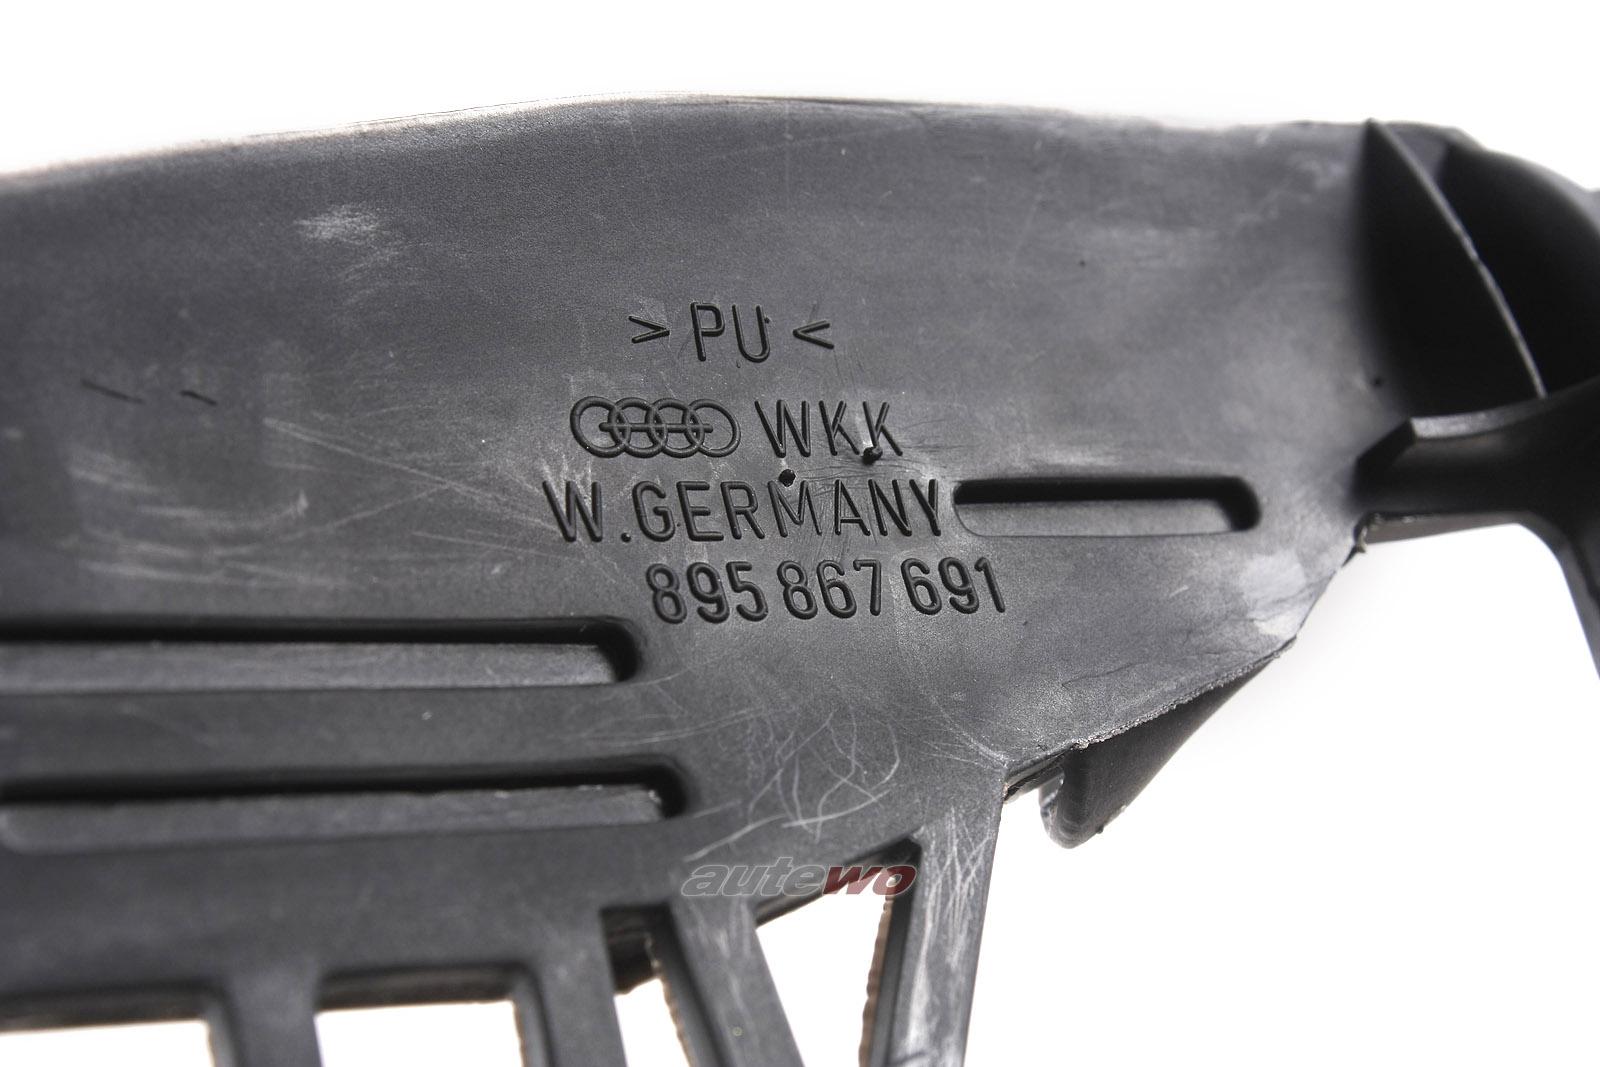 895867691 NEU Audi Coupe/Cabrio 89 Dichtungsstück Türverkleidung Vorne Links